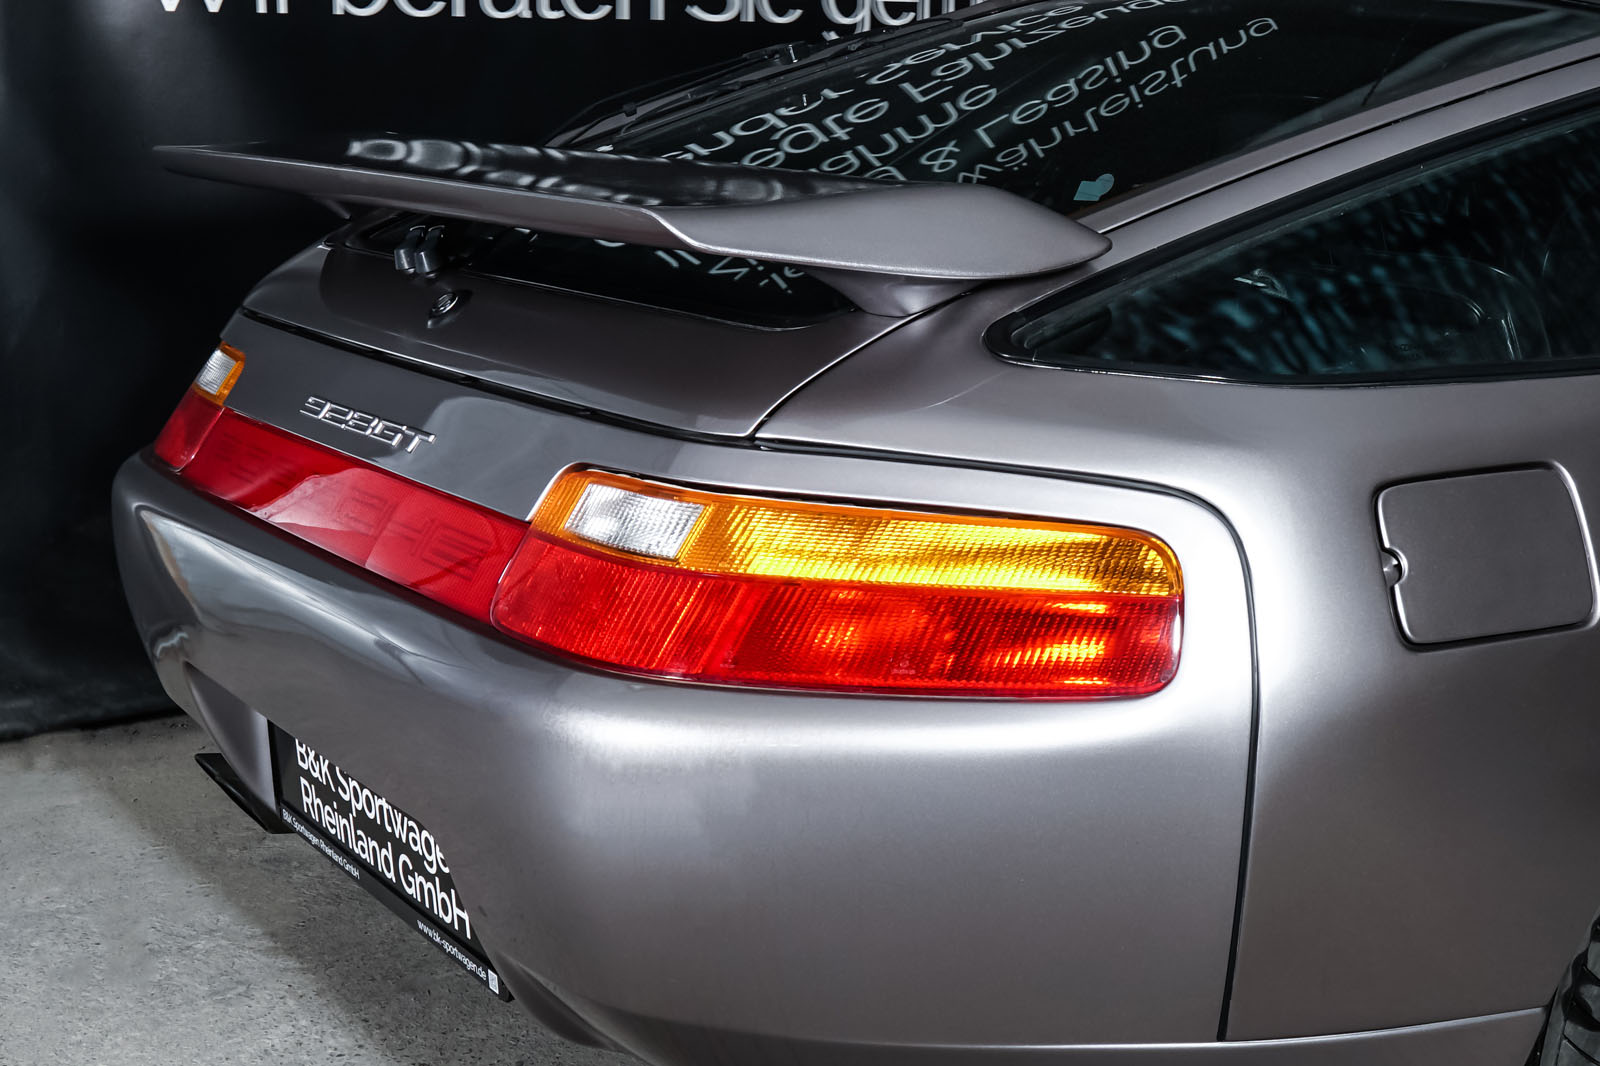 Porsche_928_Grau_Schwarz_POR-0325_18_w